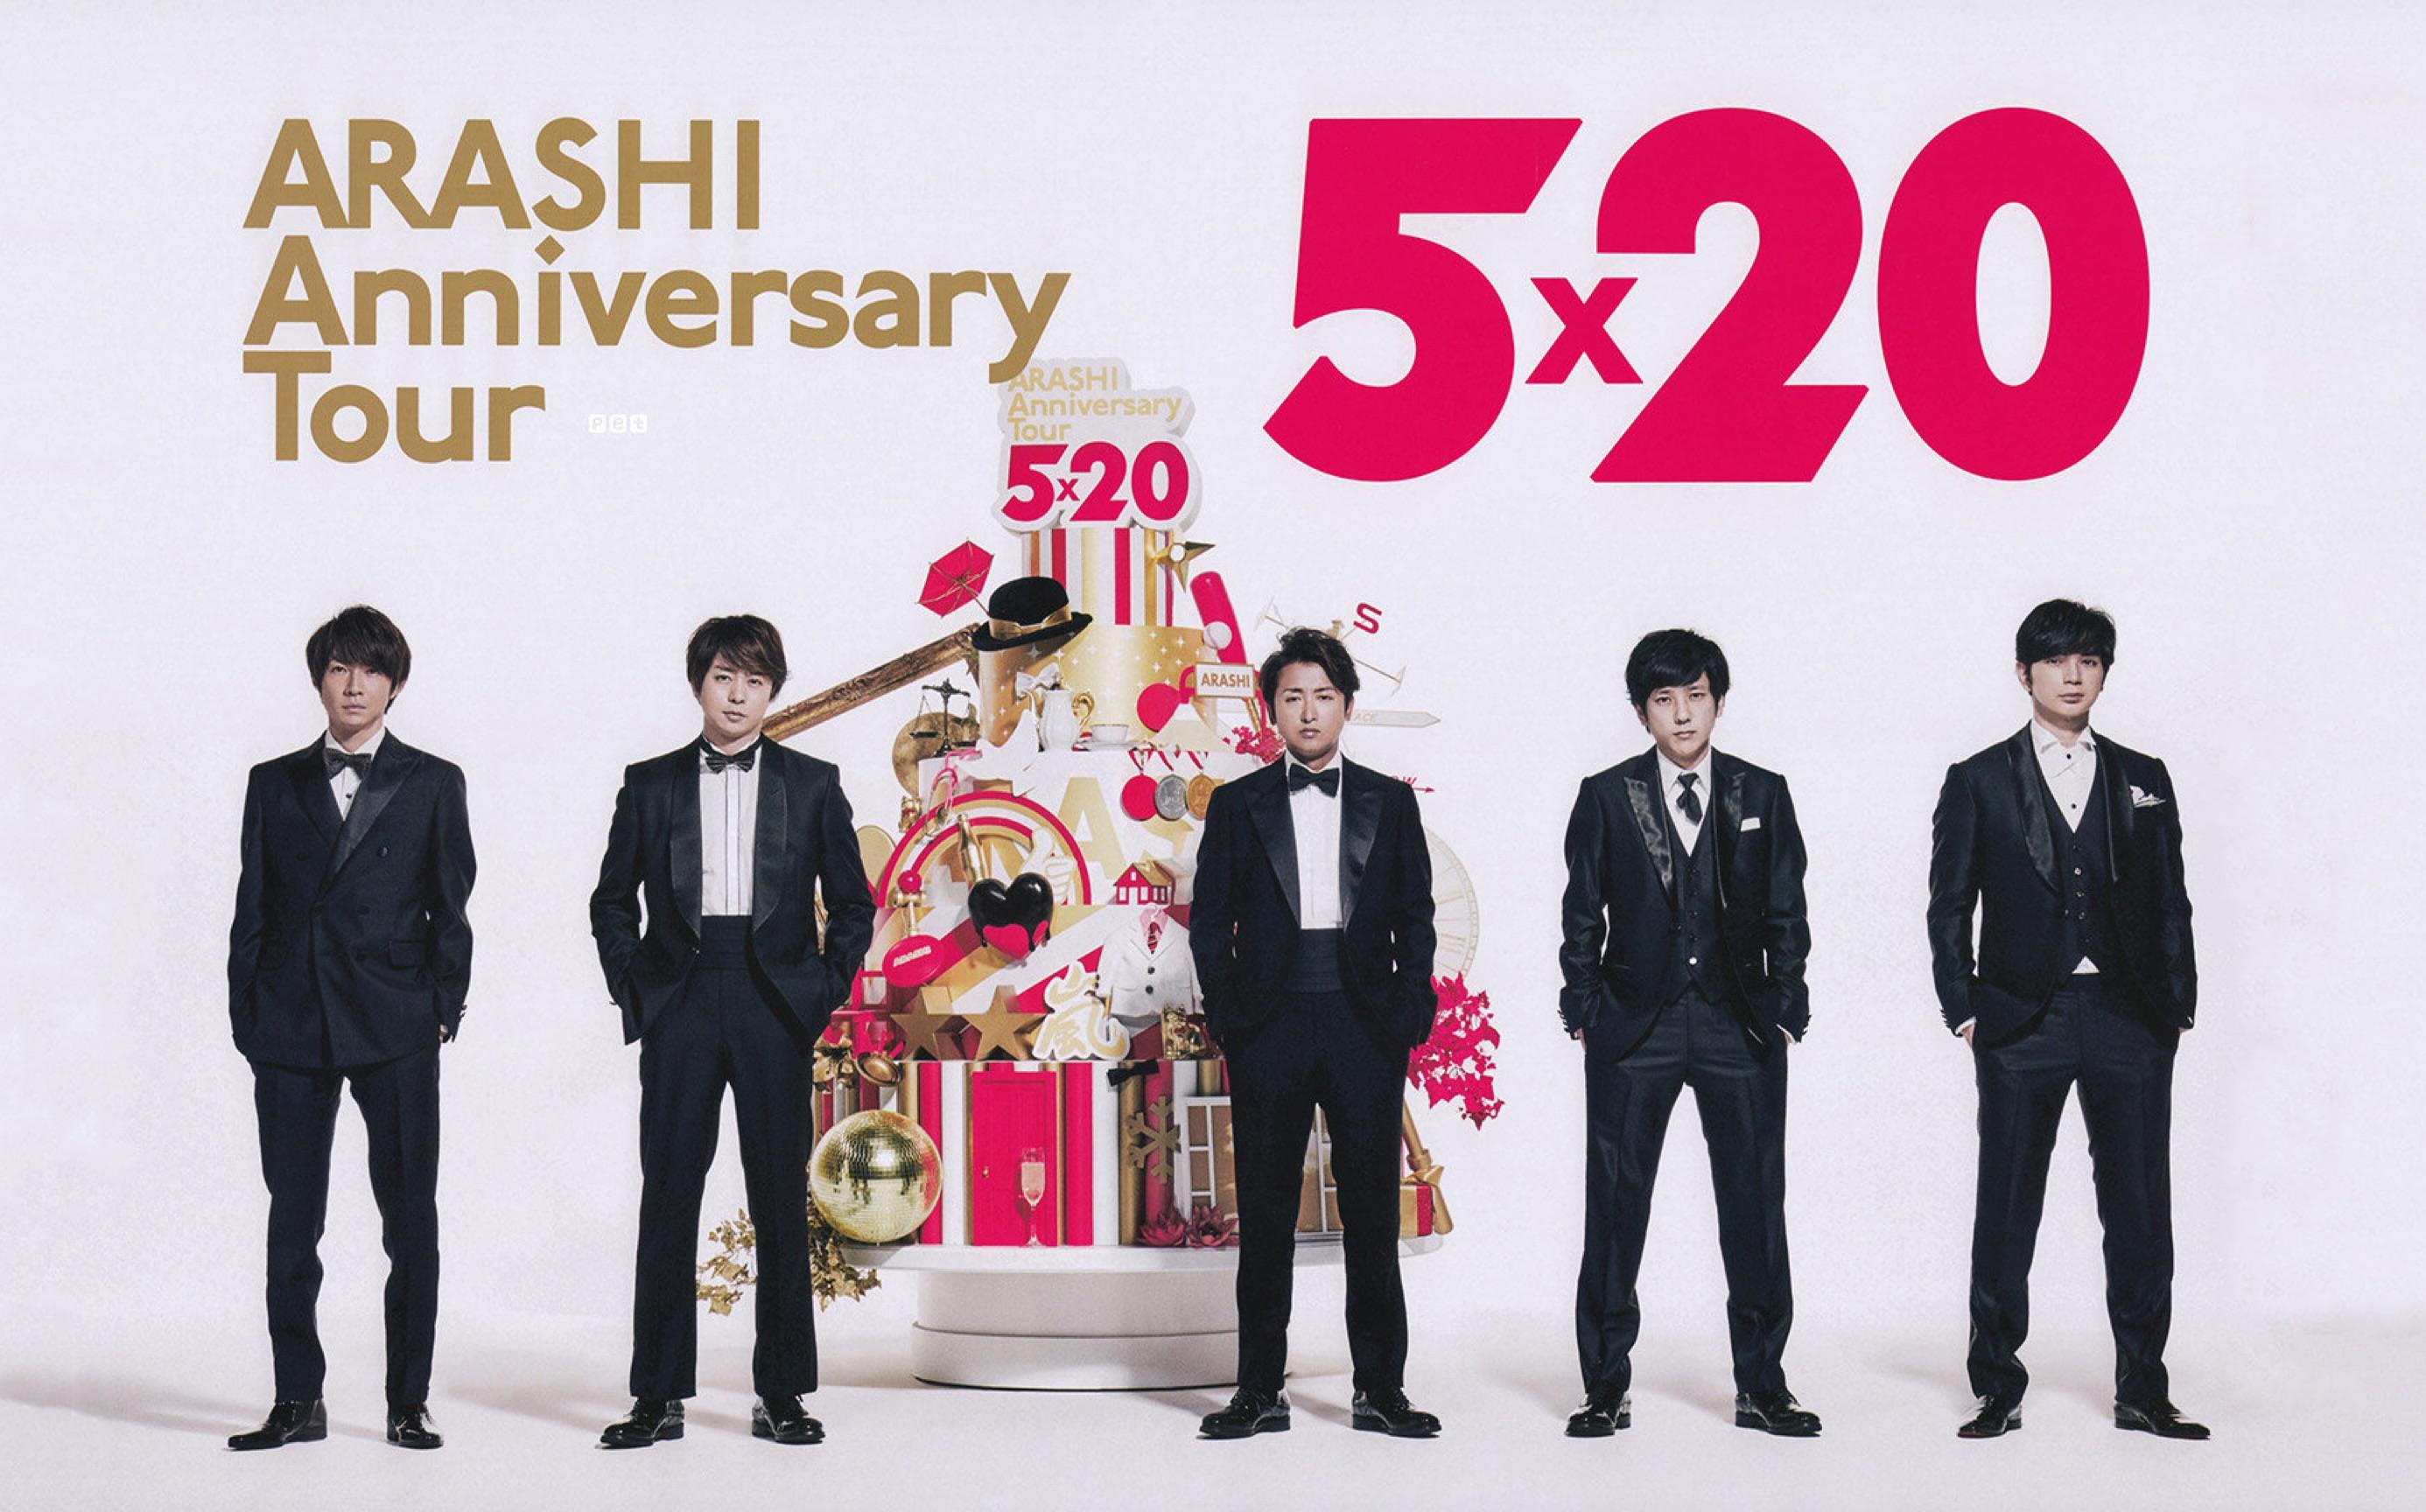 arashi_5x20 on JumPic com